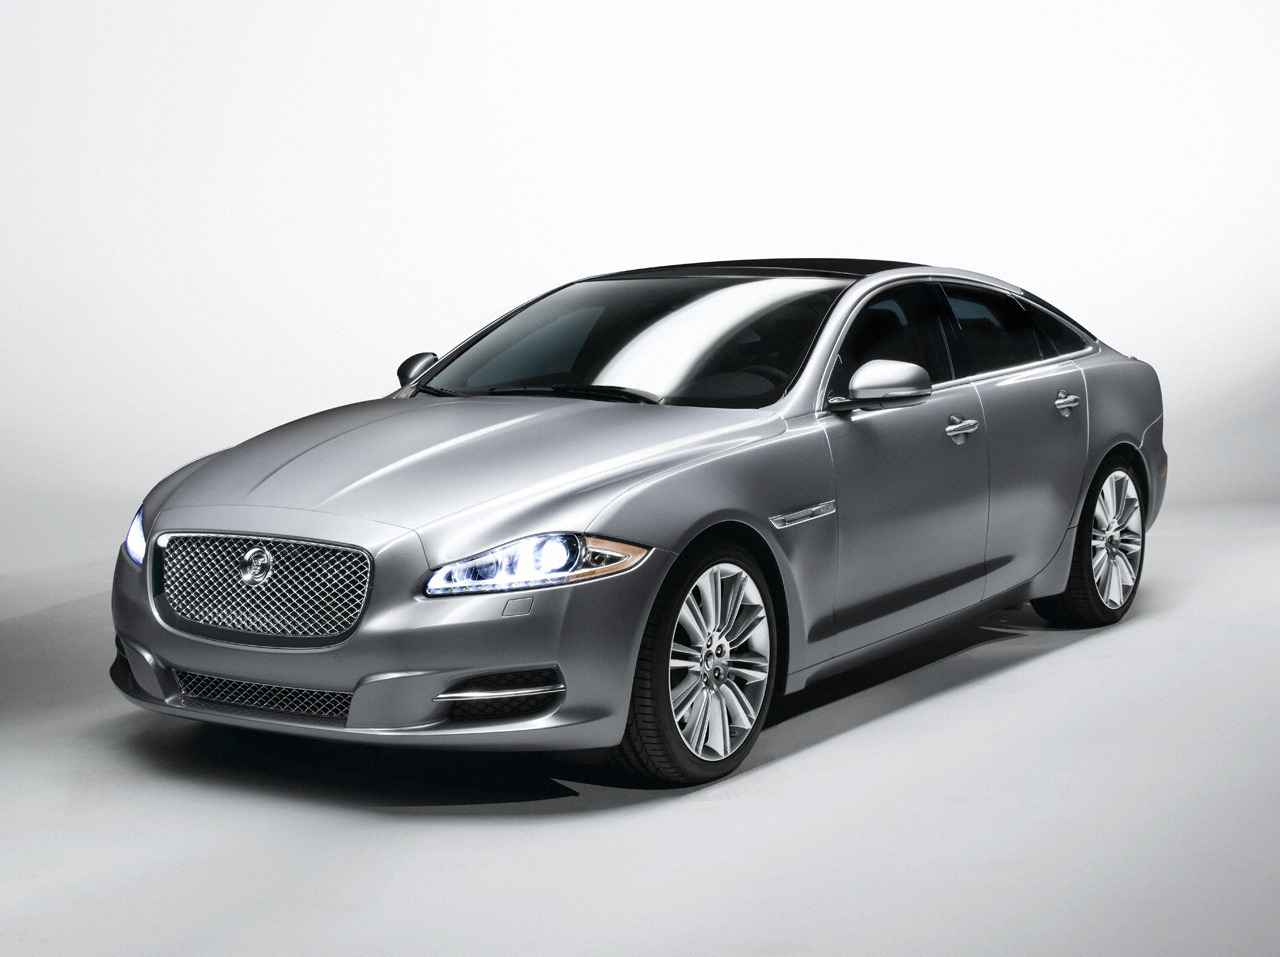 grey jaguar XJ image